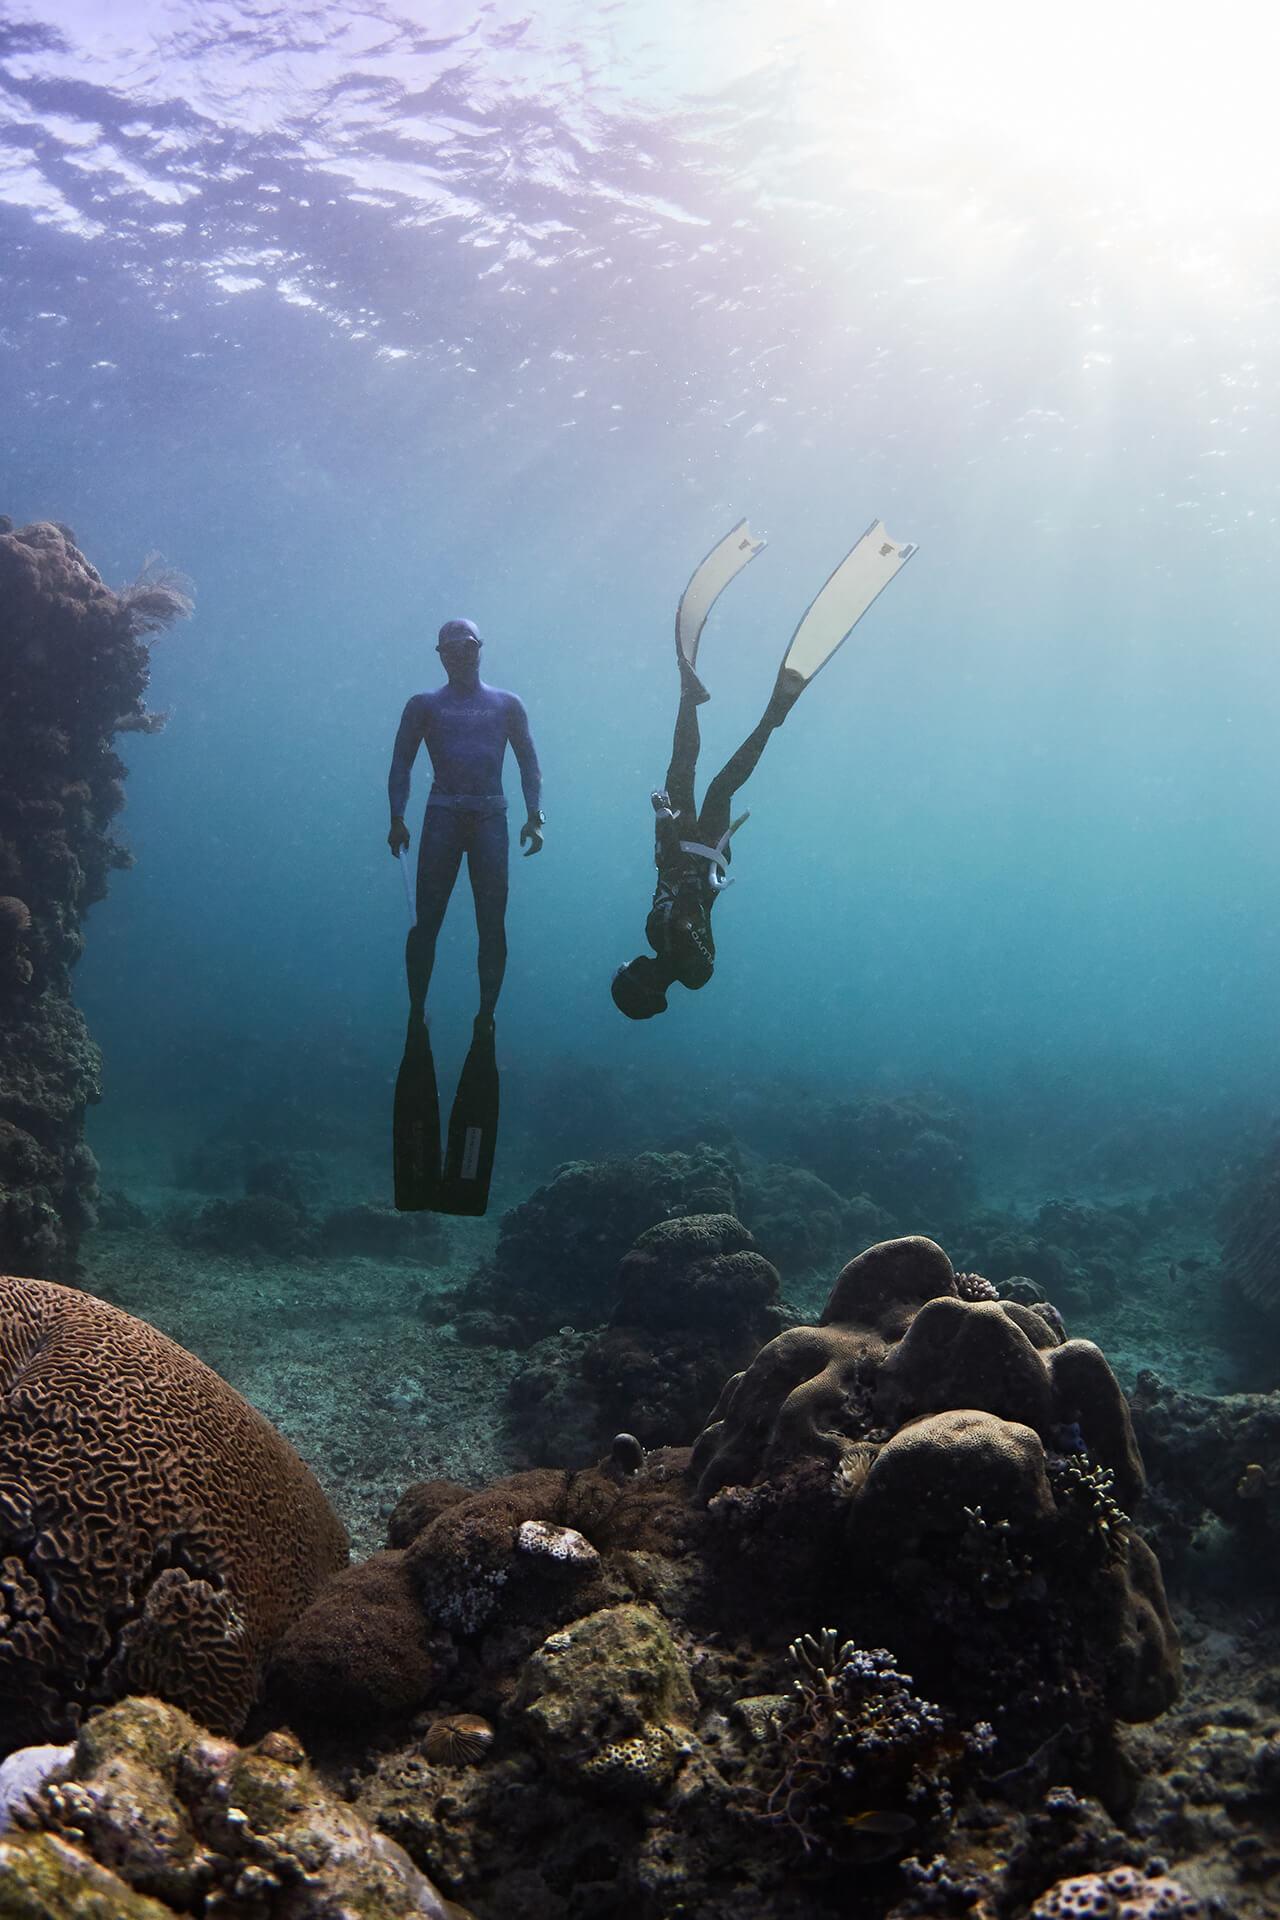 Two freedivers underwater